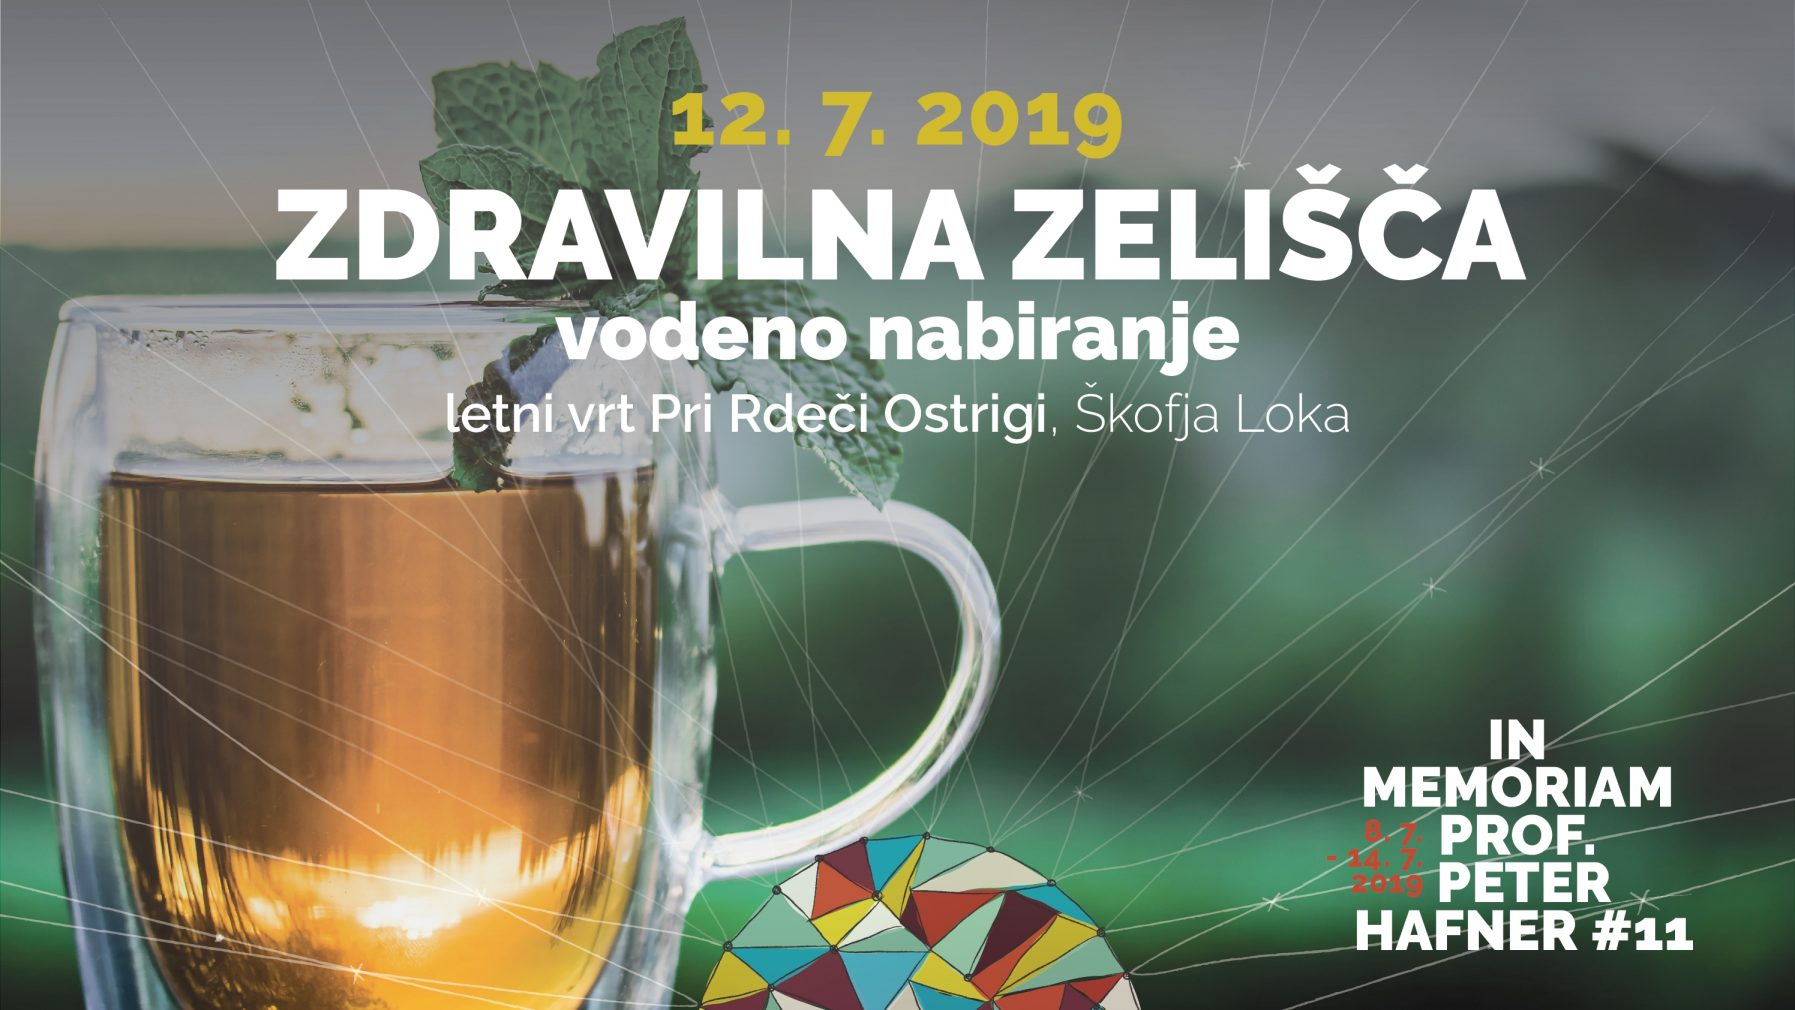 FB_Zelissca-01